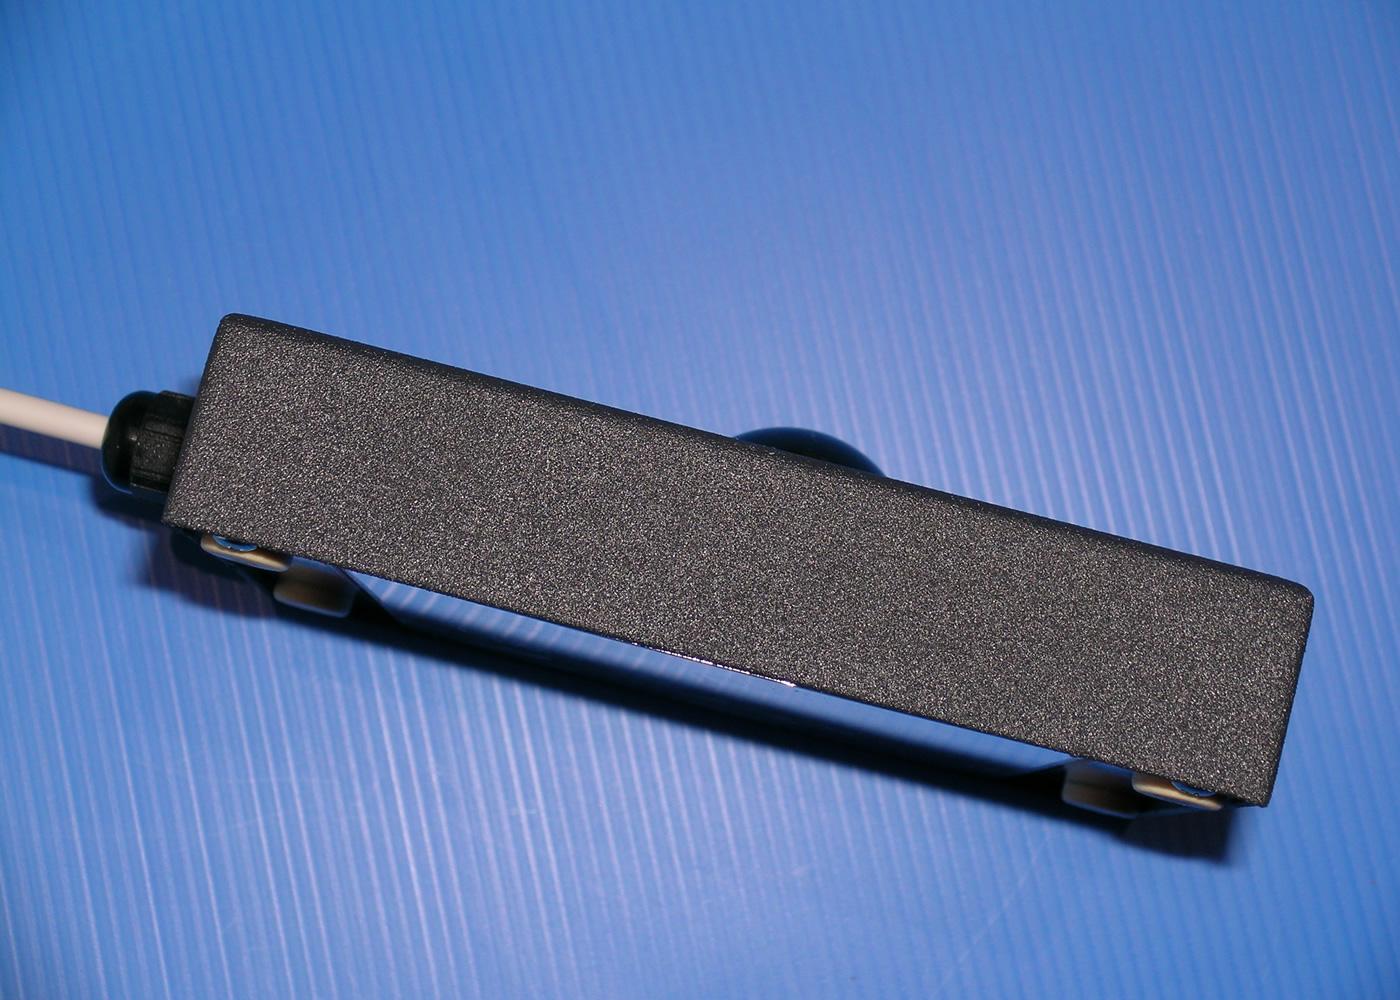 Trackball 38mm industrielle en boitier de table – Vue de coté